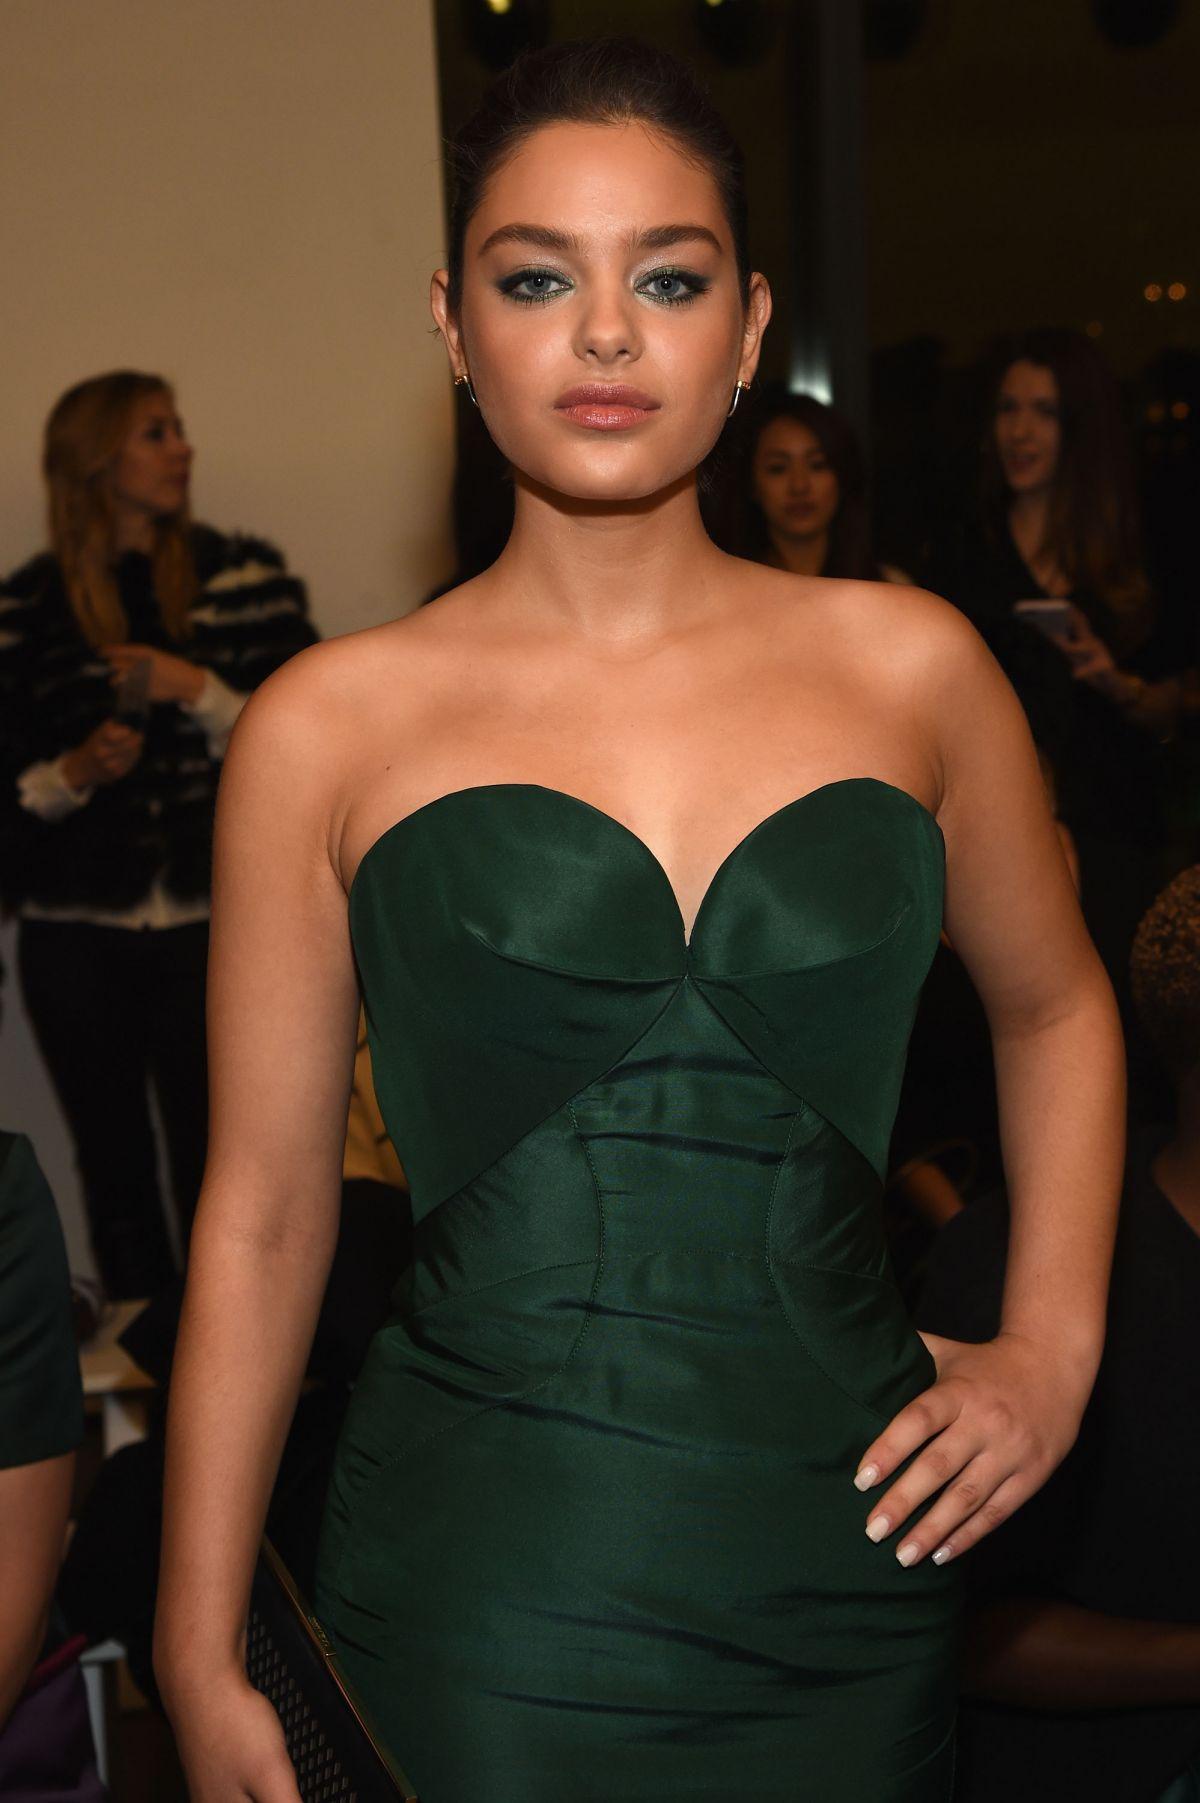 ODEYA RUSH at Zac Posen Fashion Show in New York Fashion Week 02/15/2016